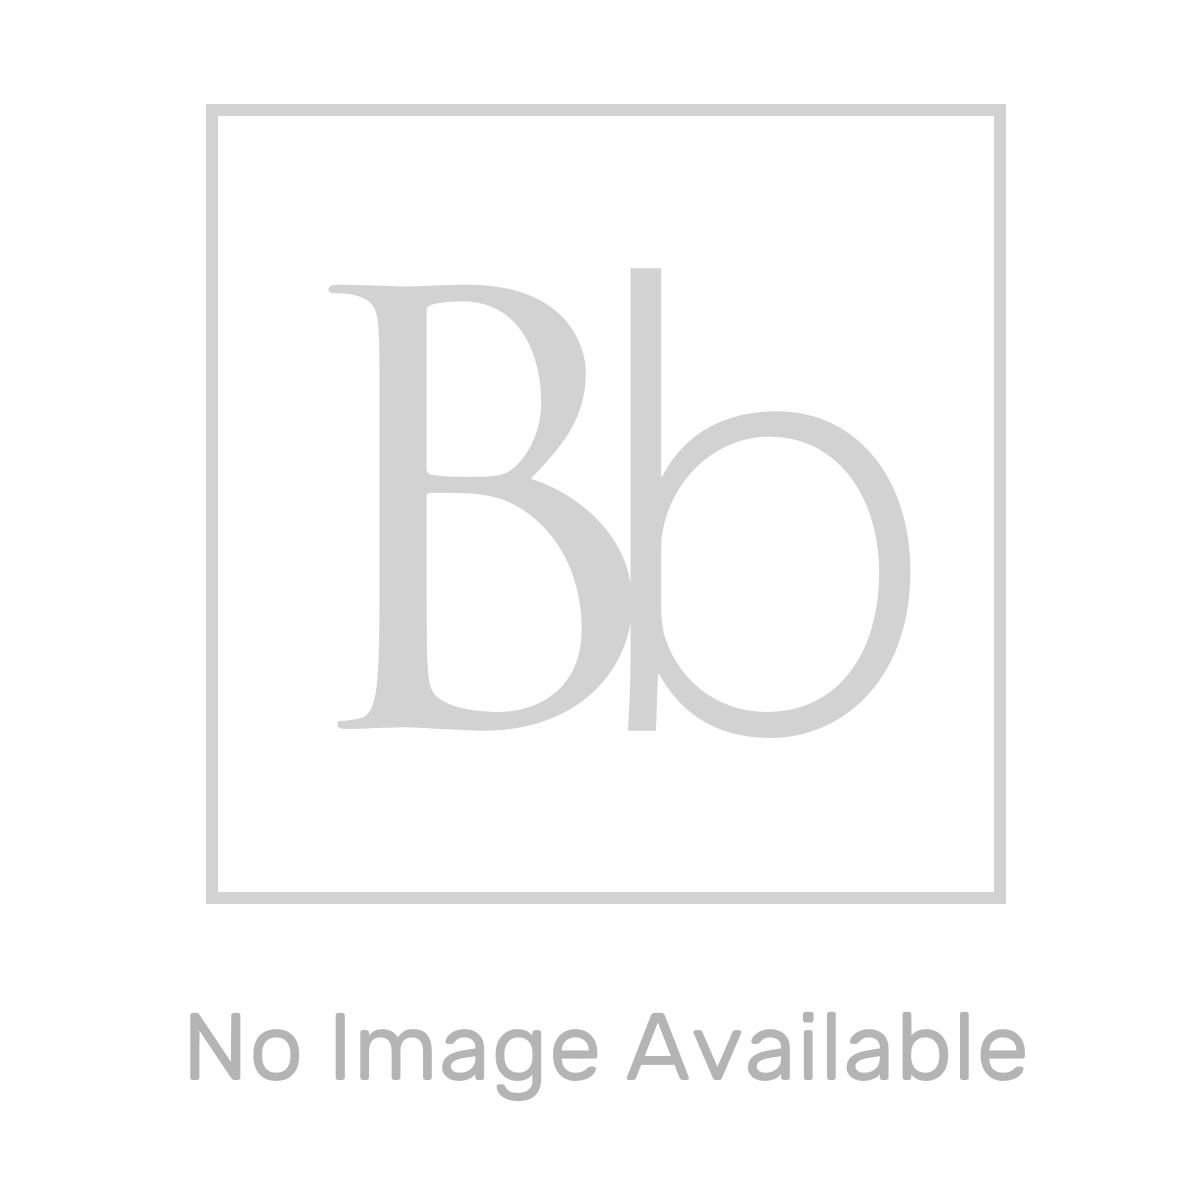 RAK Exposed Automatic Urinal Cistern 9.0L Measurements